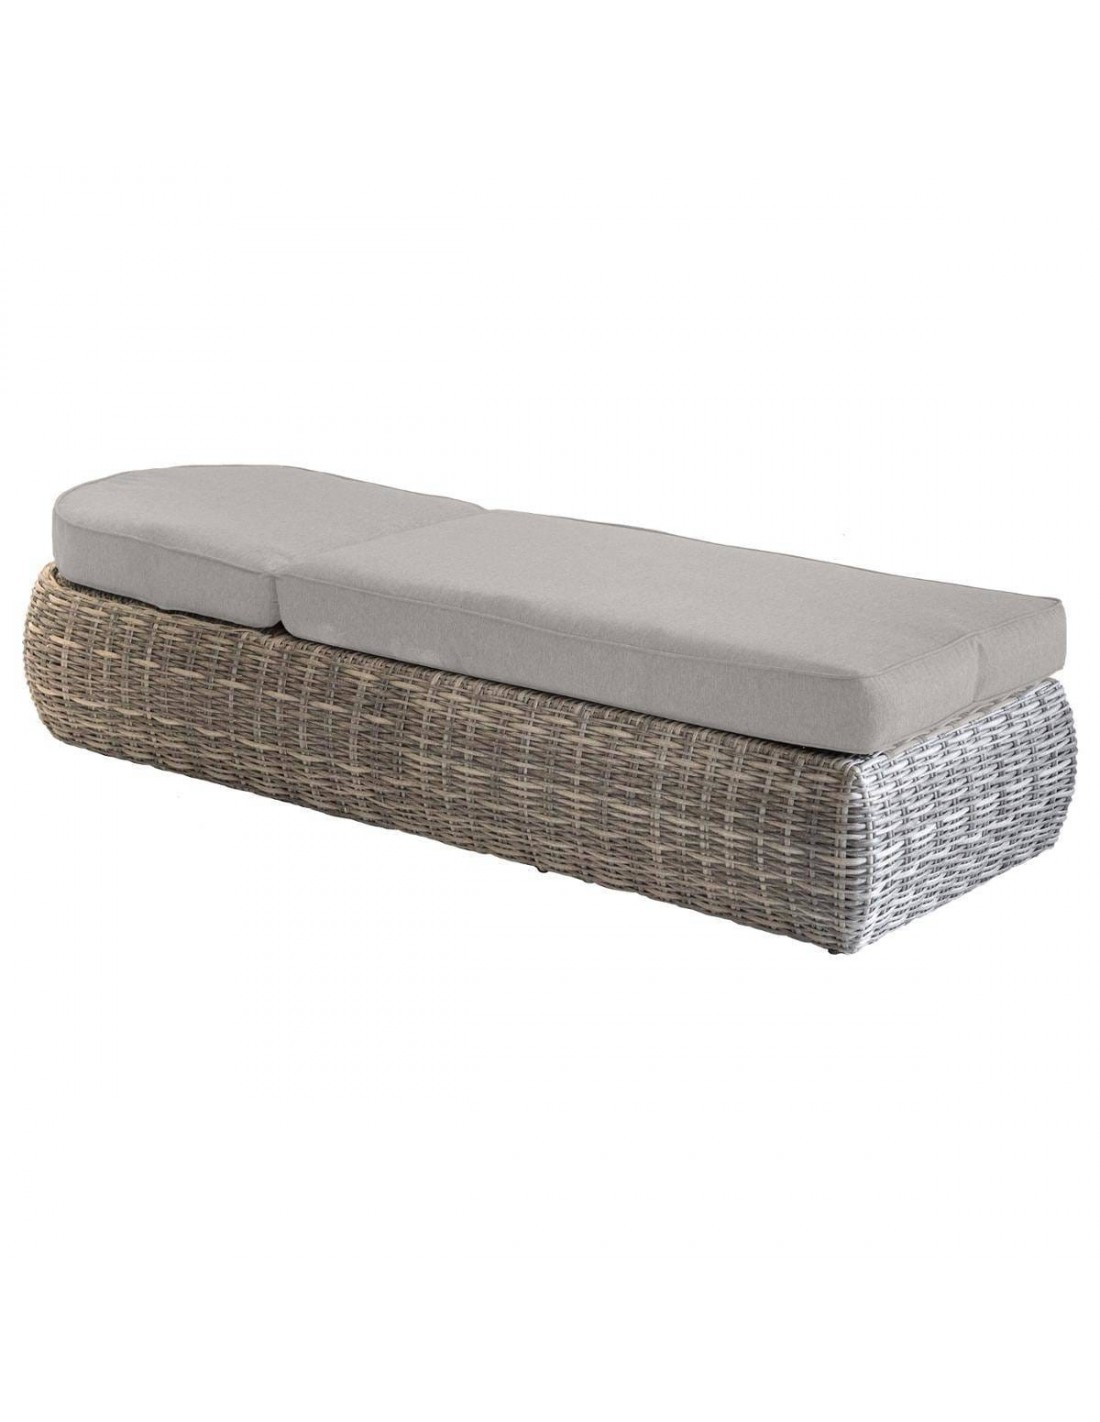 lit de piscine moor a aluminium et r sine tress e hesp ride. Black Bedroom Furniture Sets. Home Design Ideas